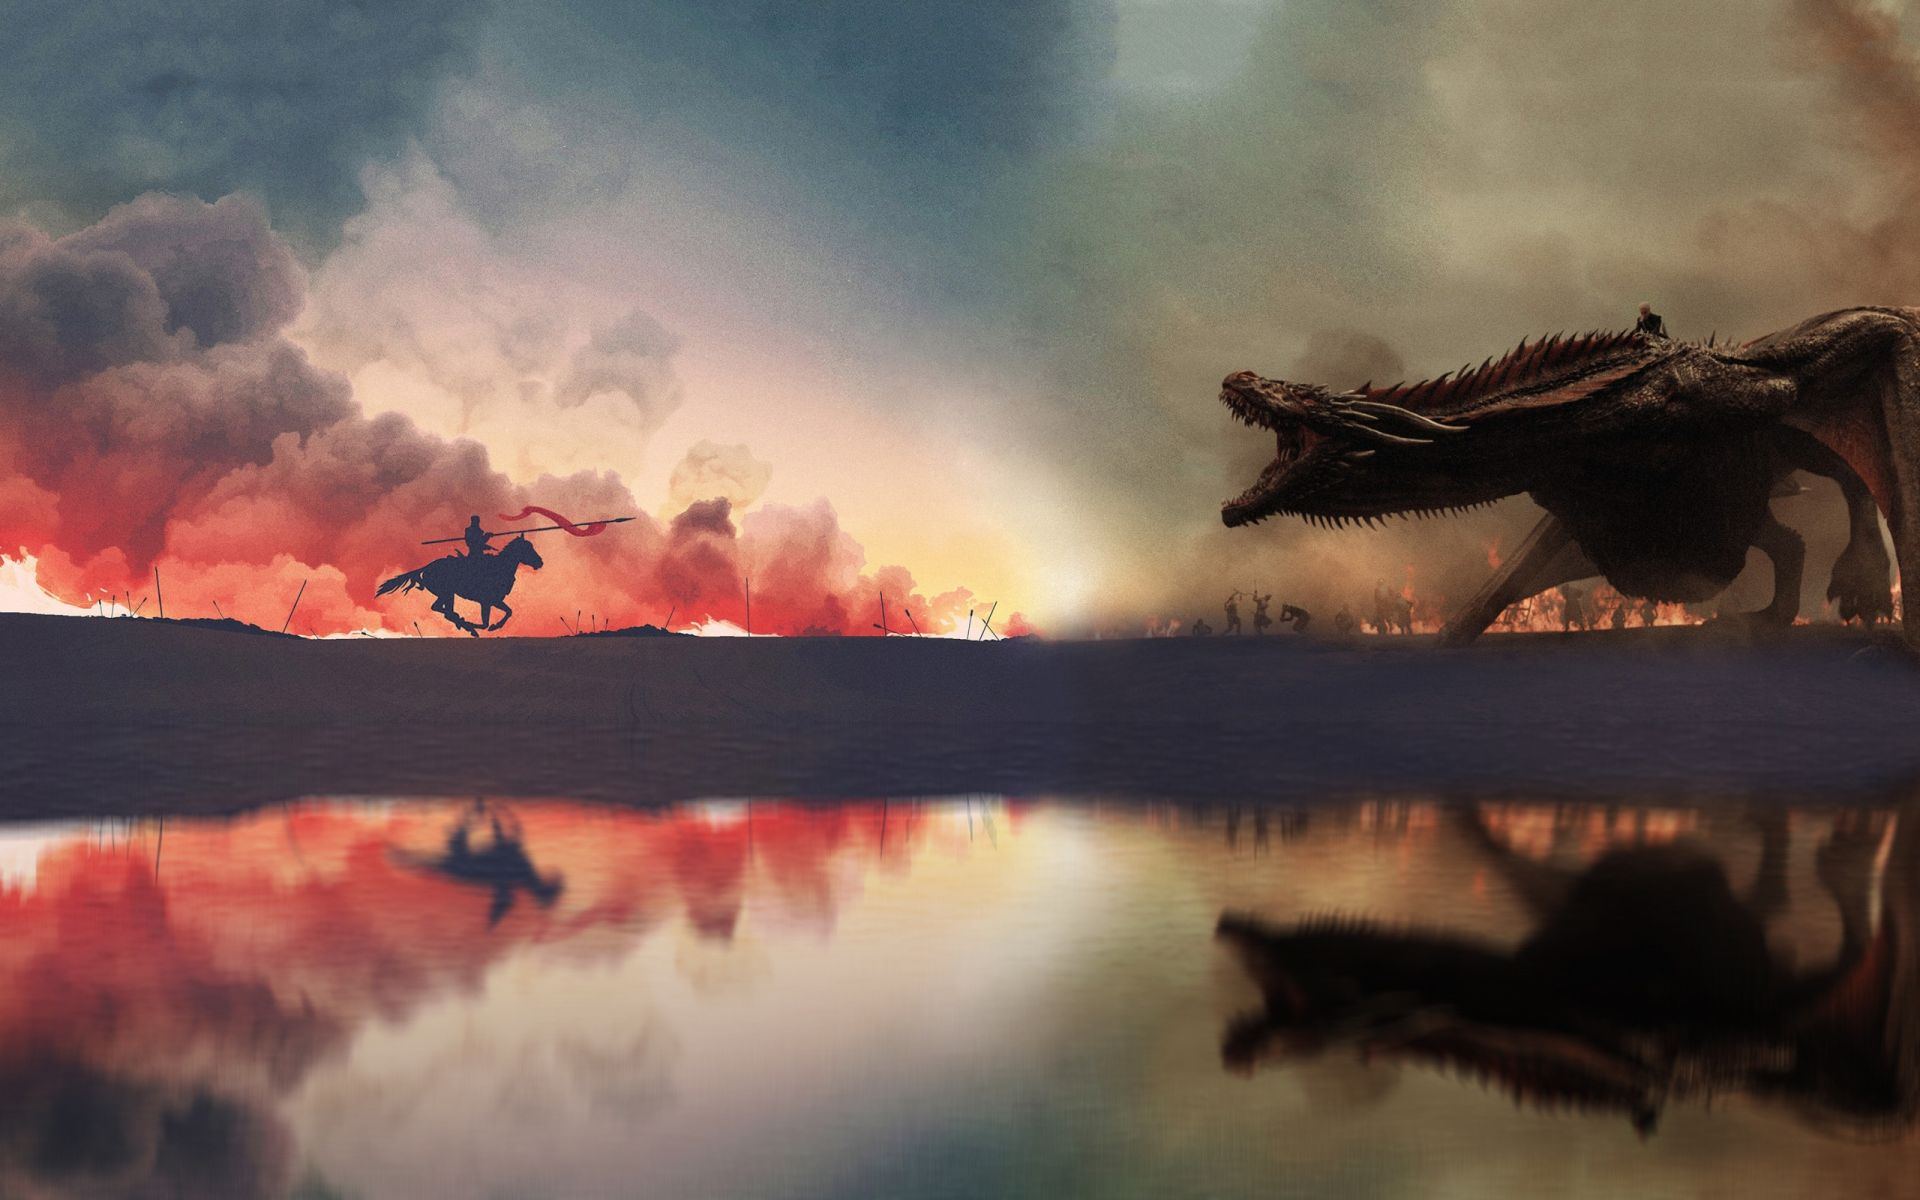 Game of Thrones Jon Snow and Dragon minimal art